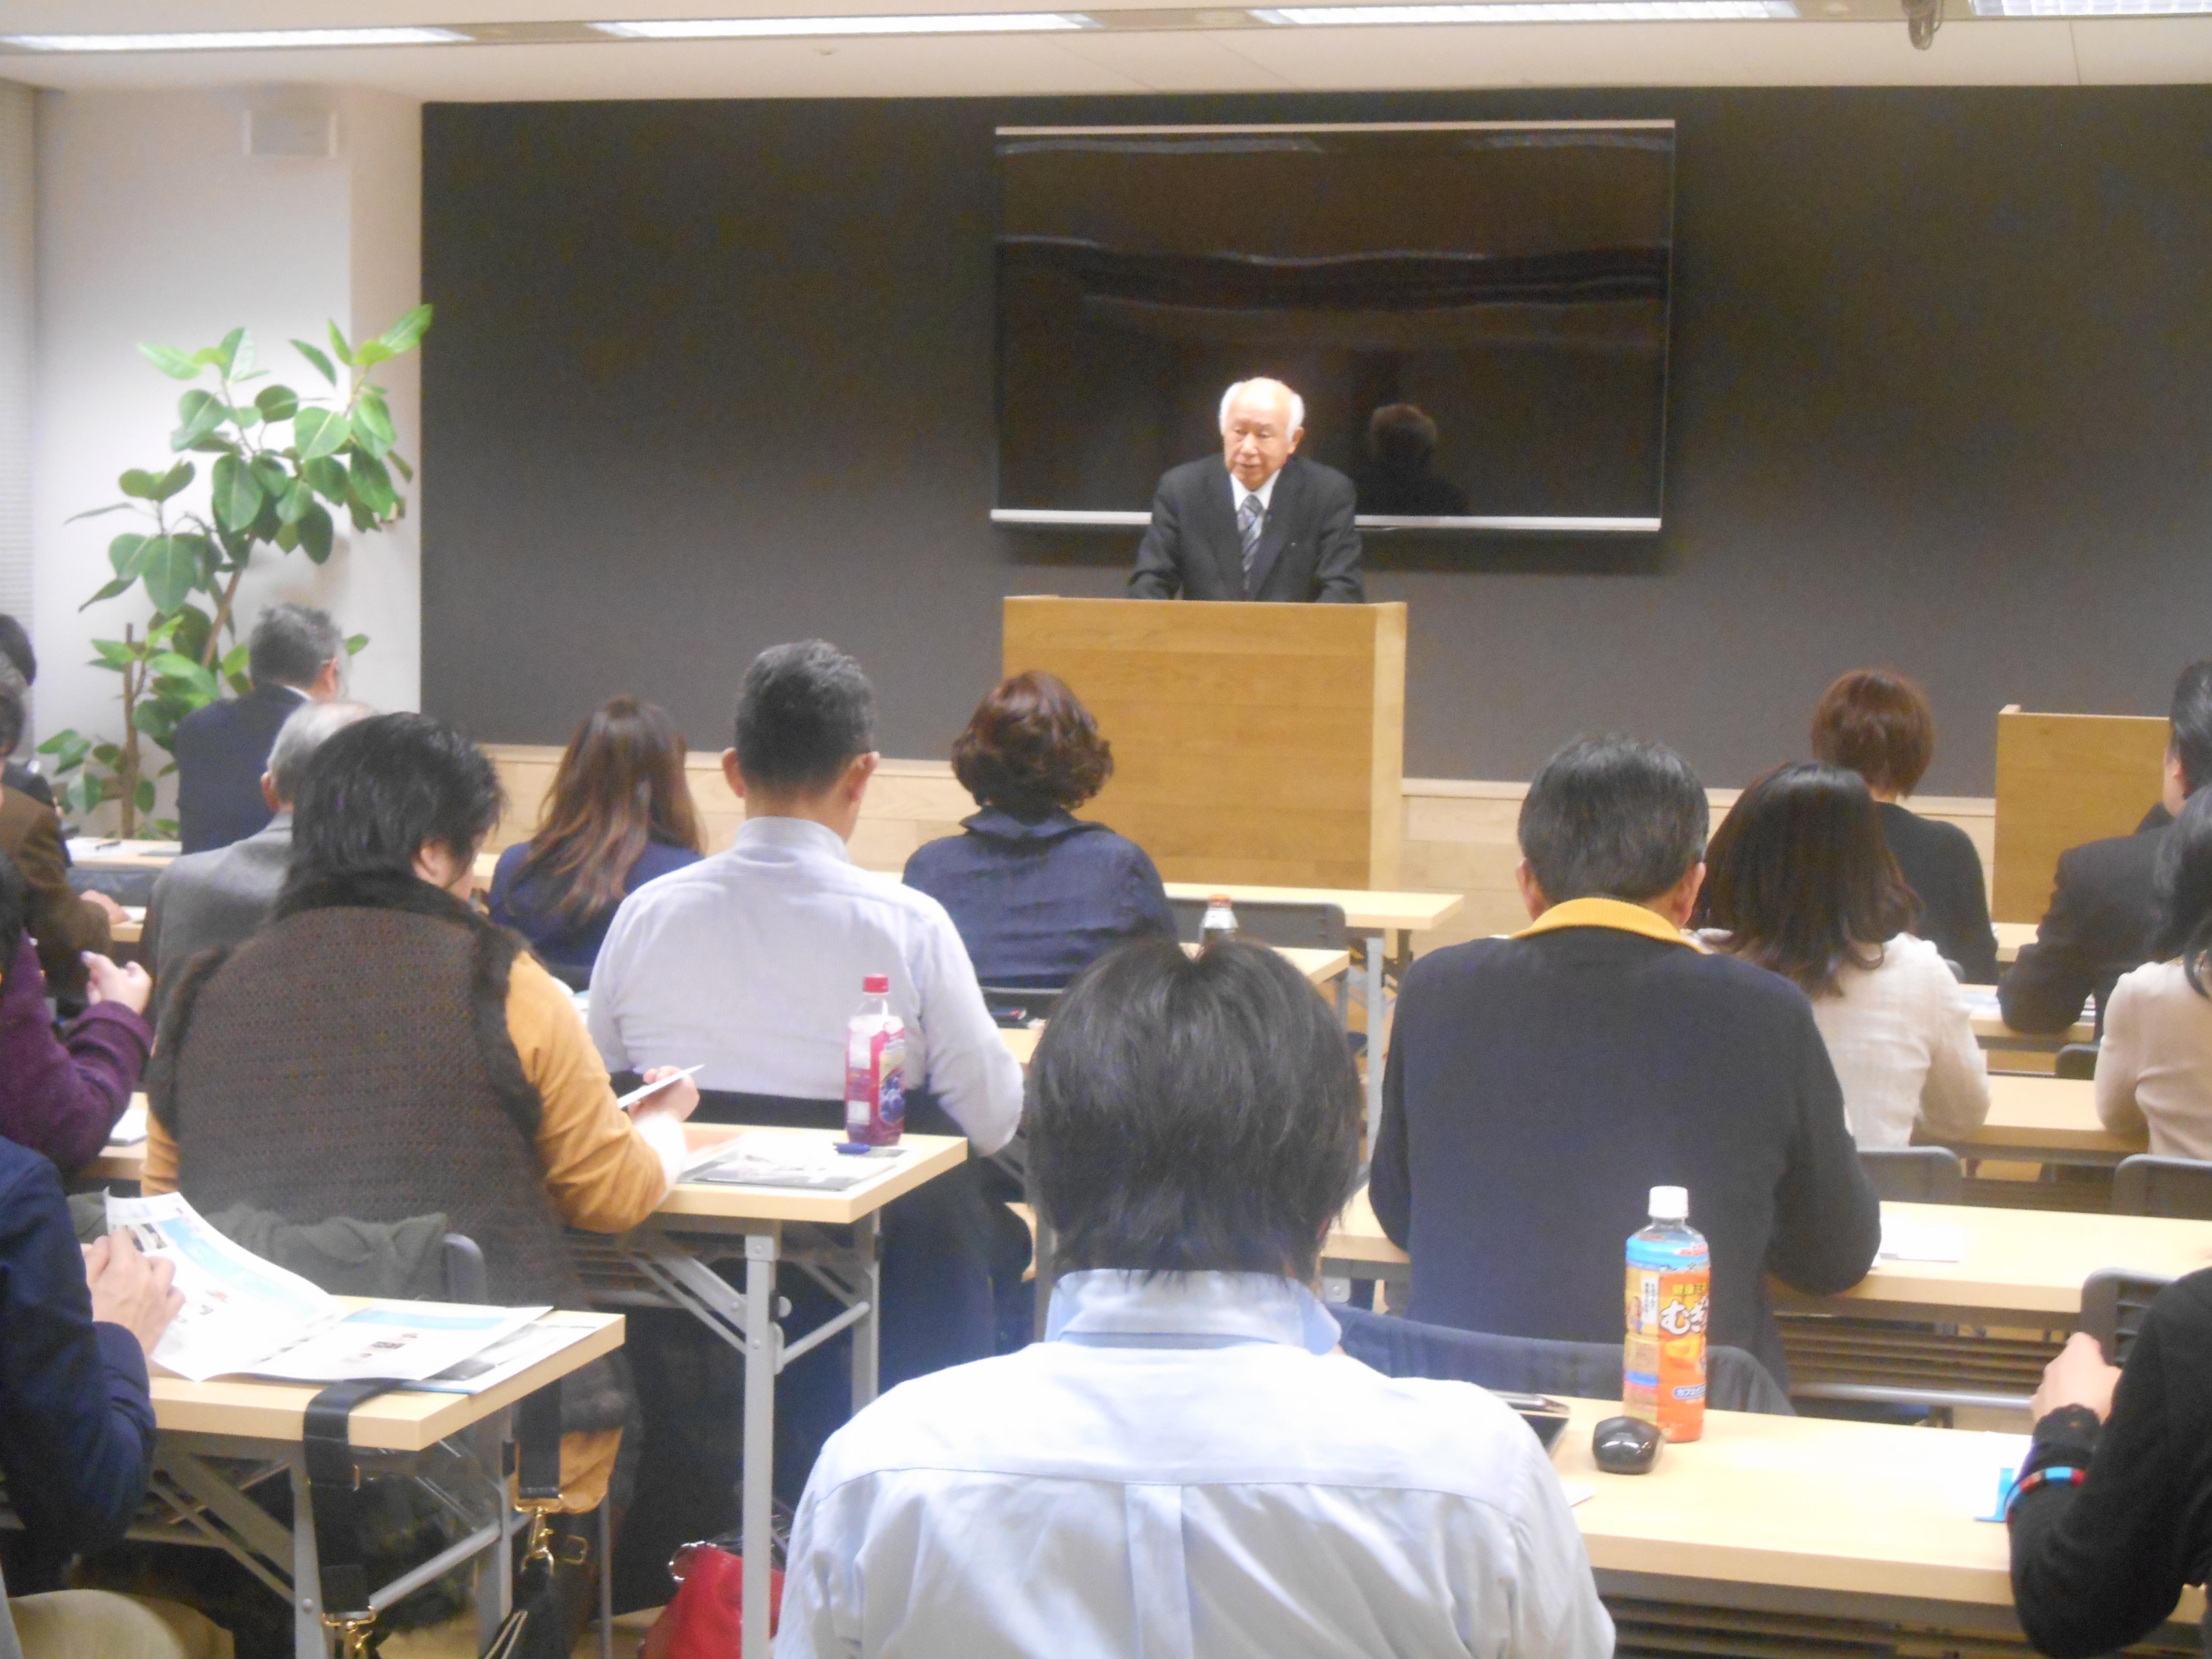 DSCN0449 - 2017年2月4日東京思風塾開催